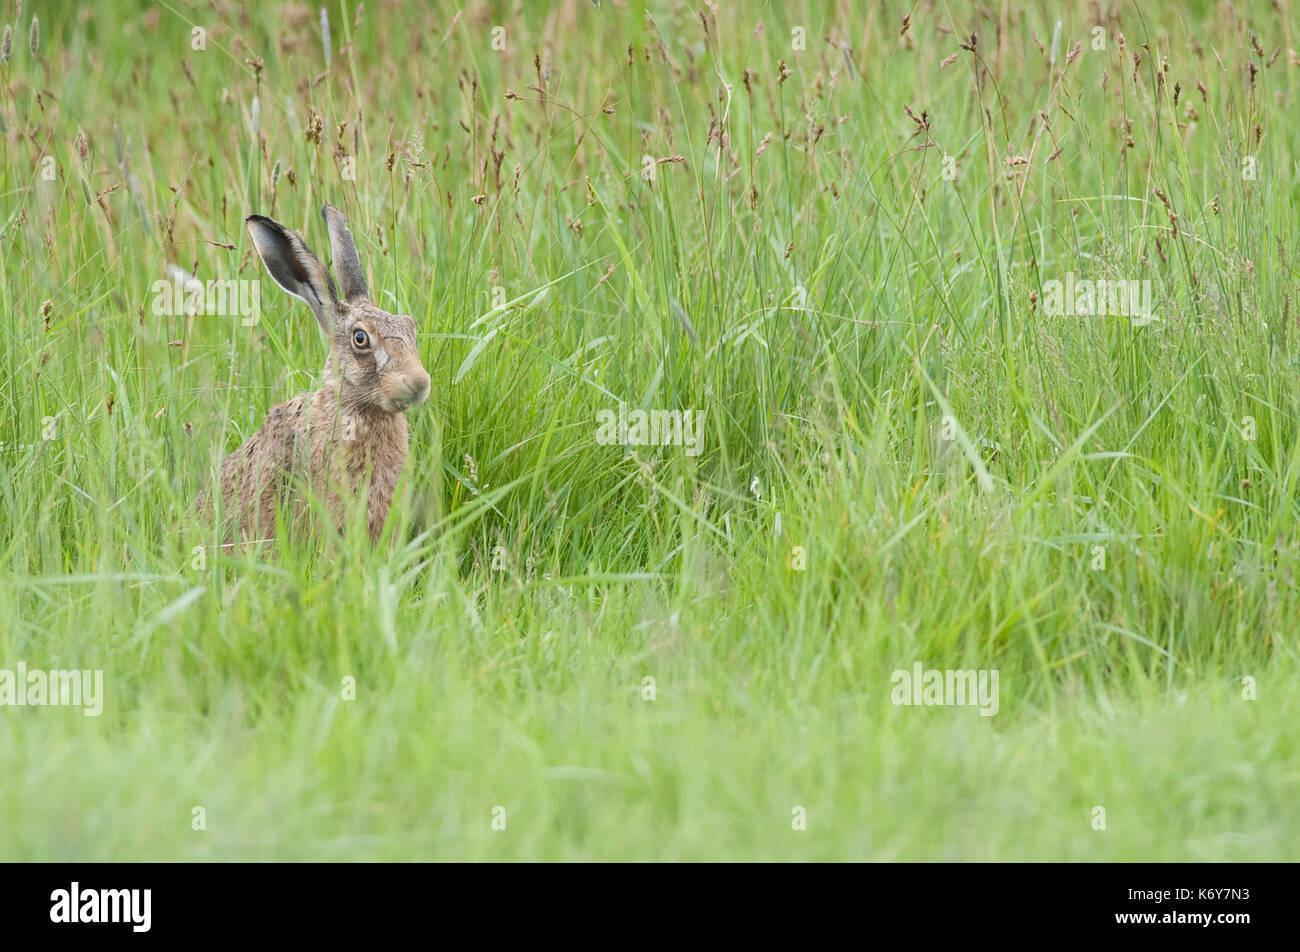 Feldhase, Lepus europaeus, elmley Marsh, Kent GROSSBRITANNIEN, versteckt in langen Gras Stockfoto